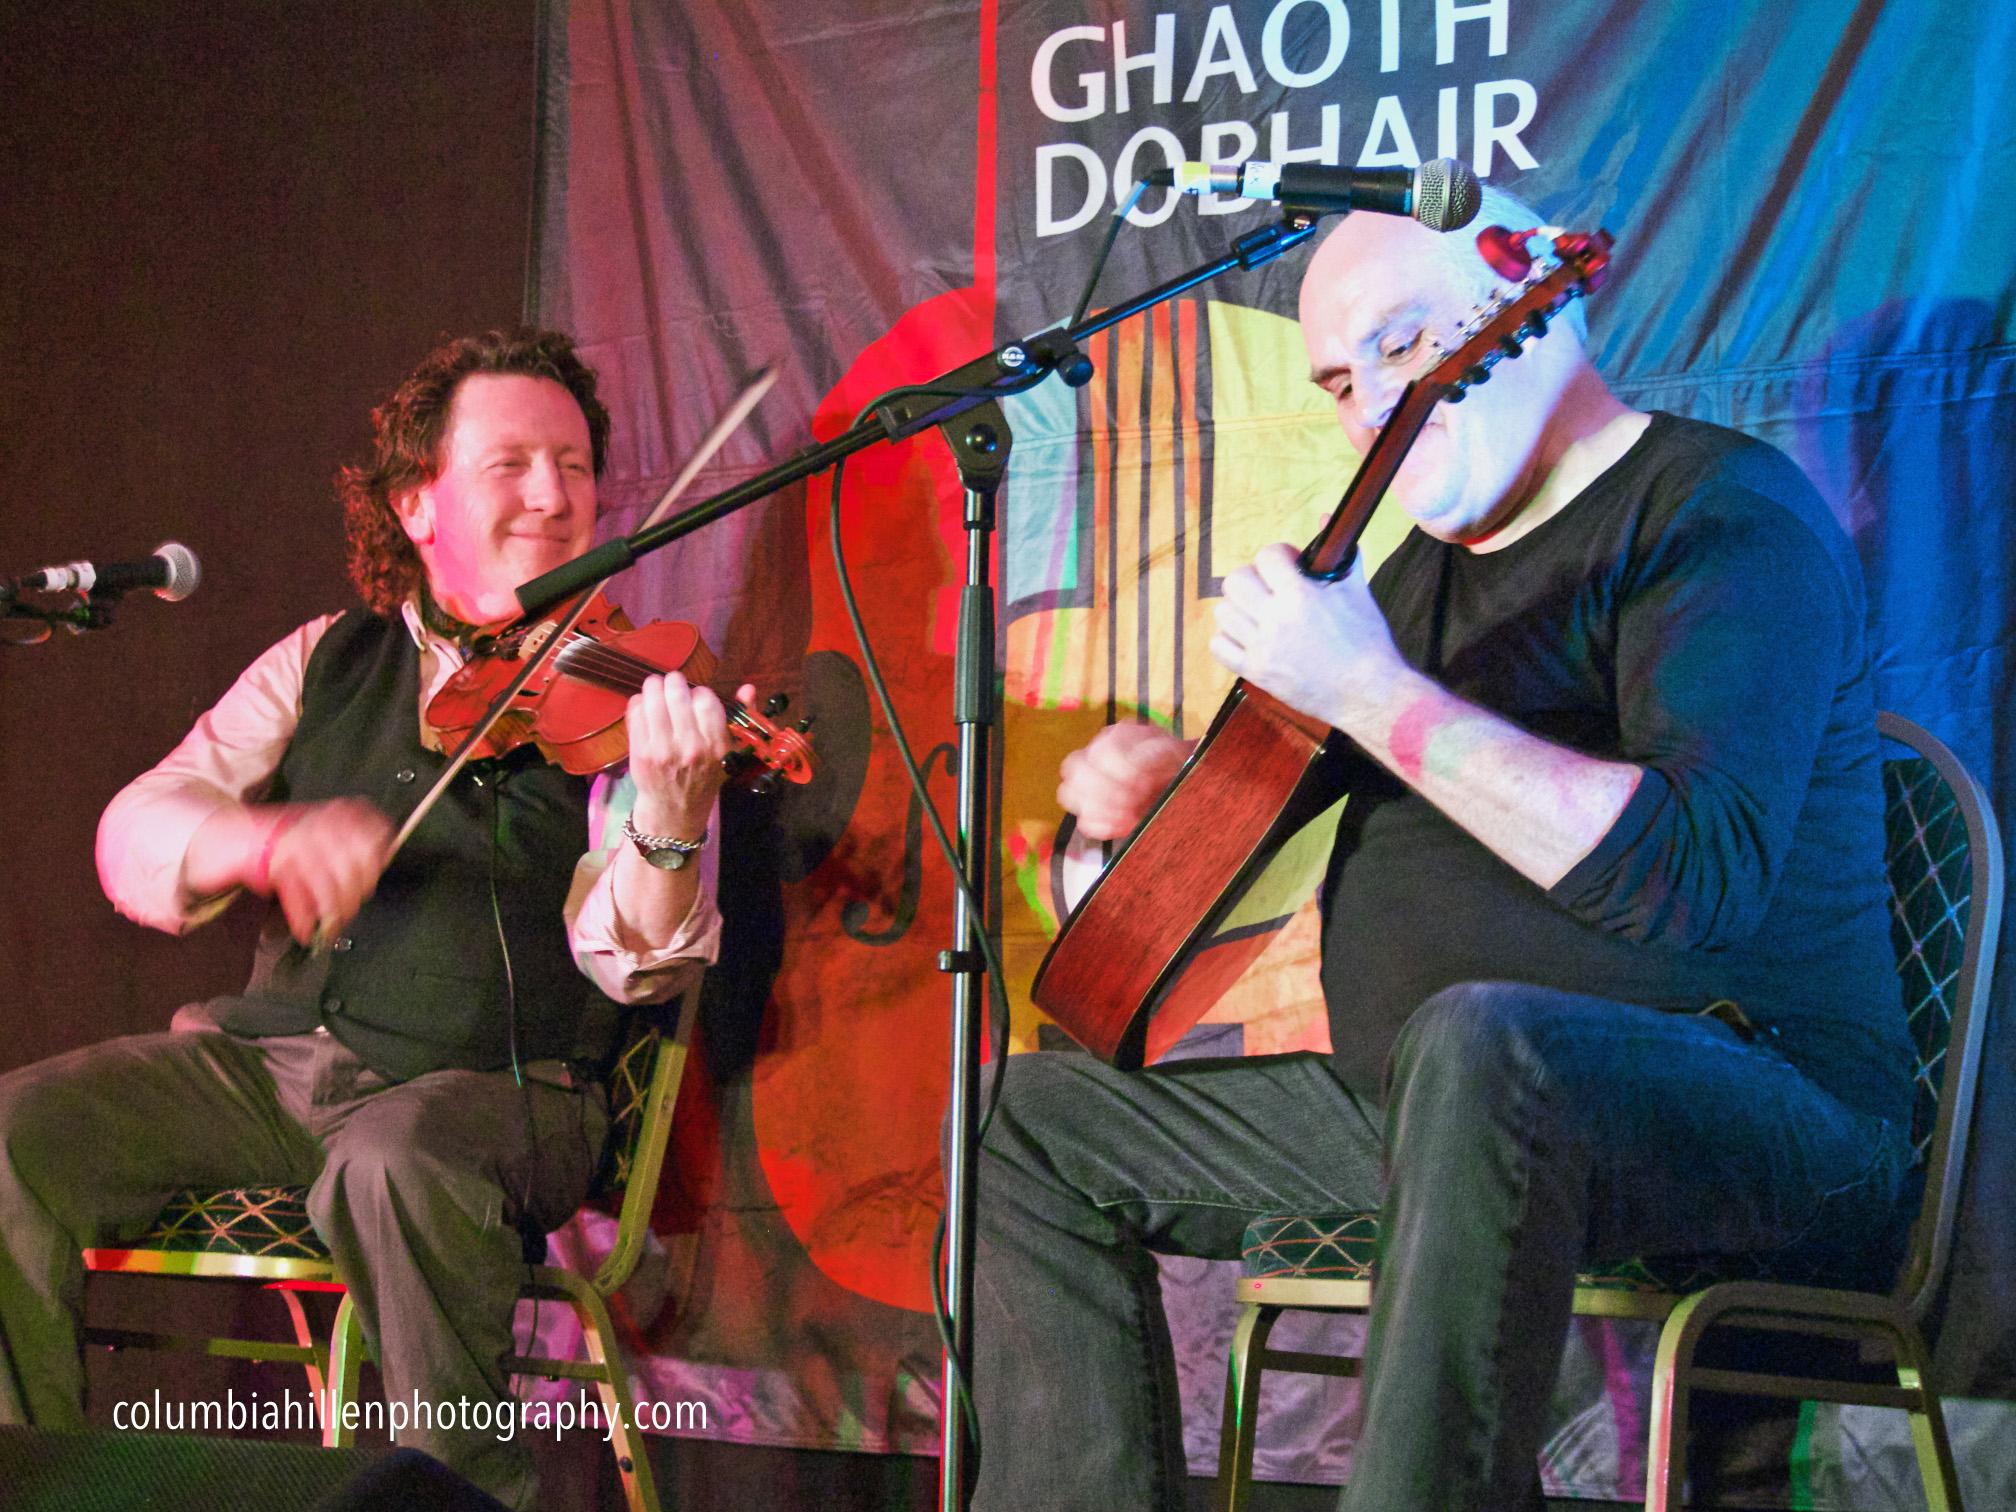 Frankie Gavin, Brendan O'Regan, Donegal Irish music